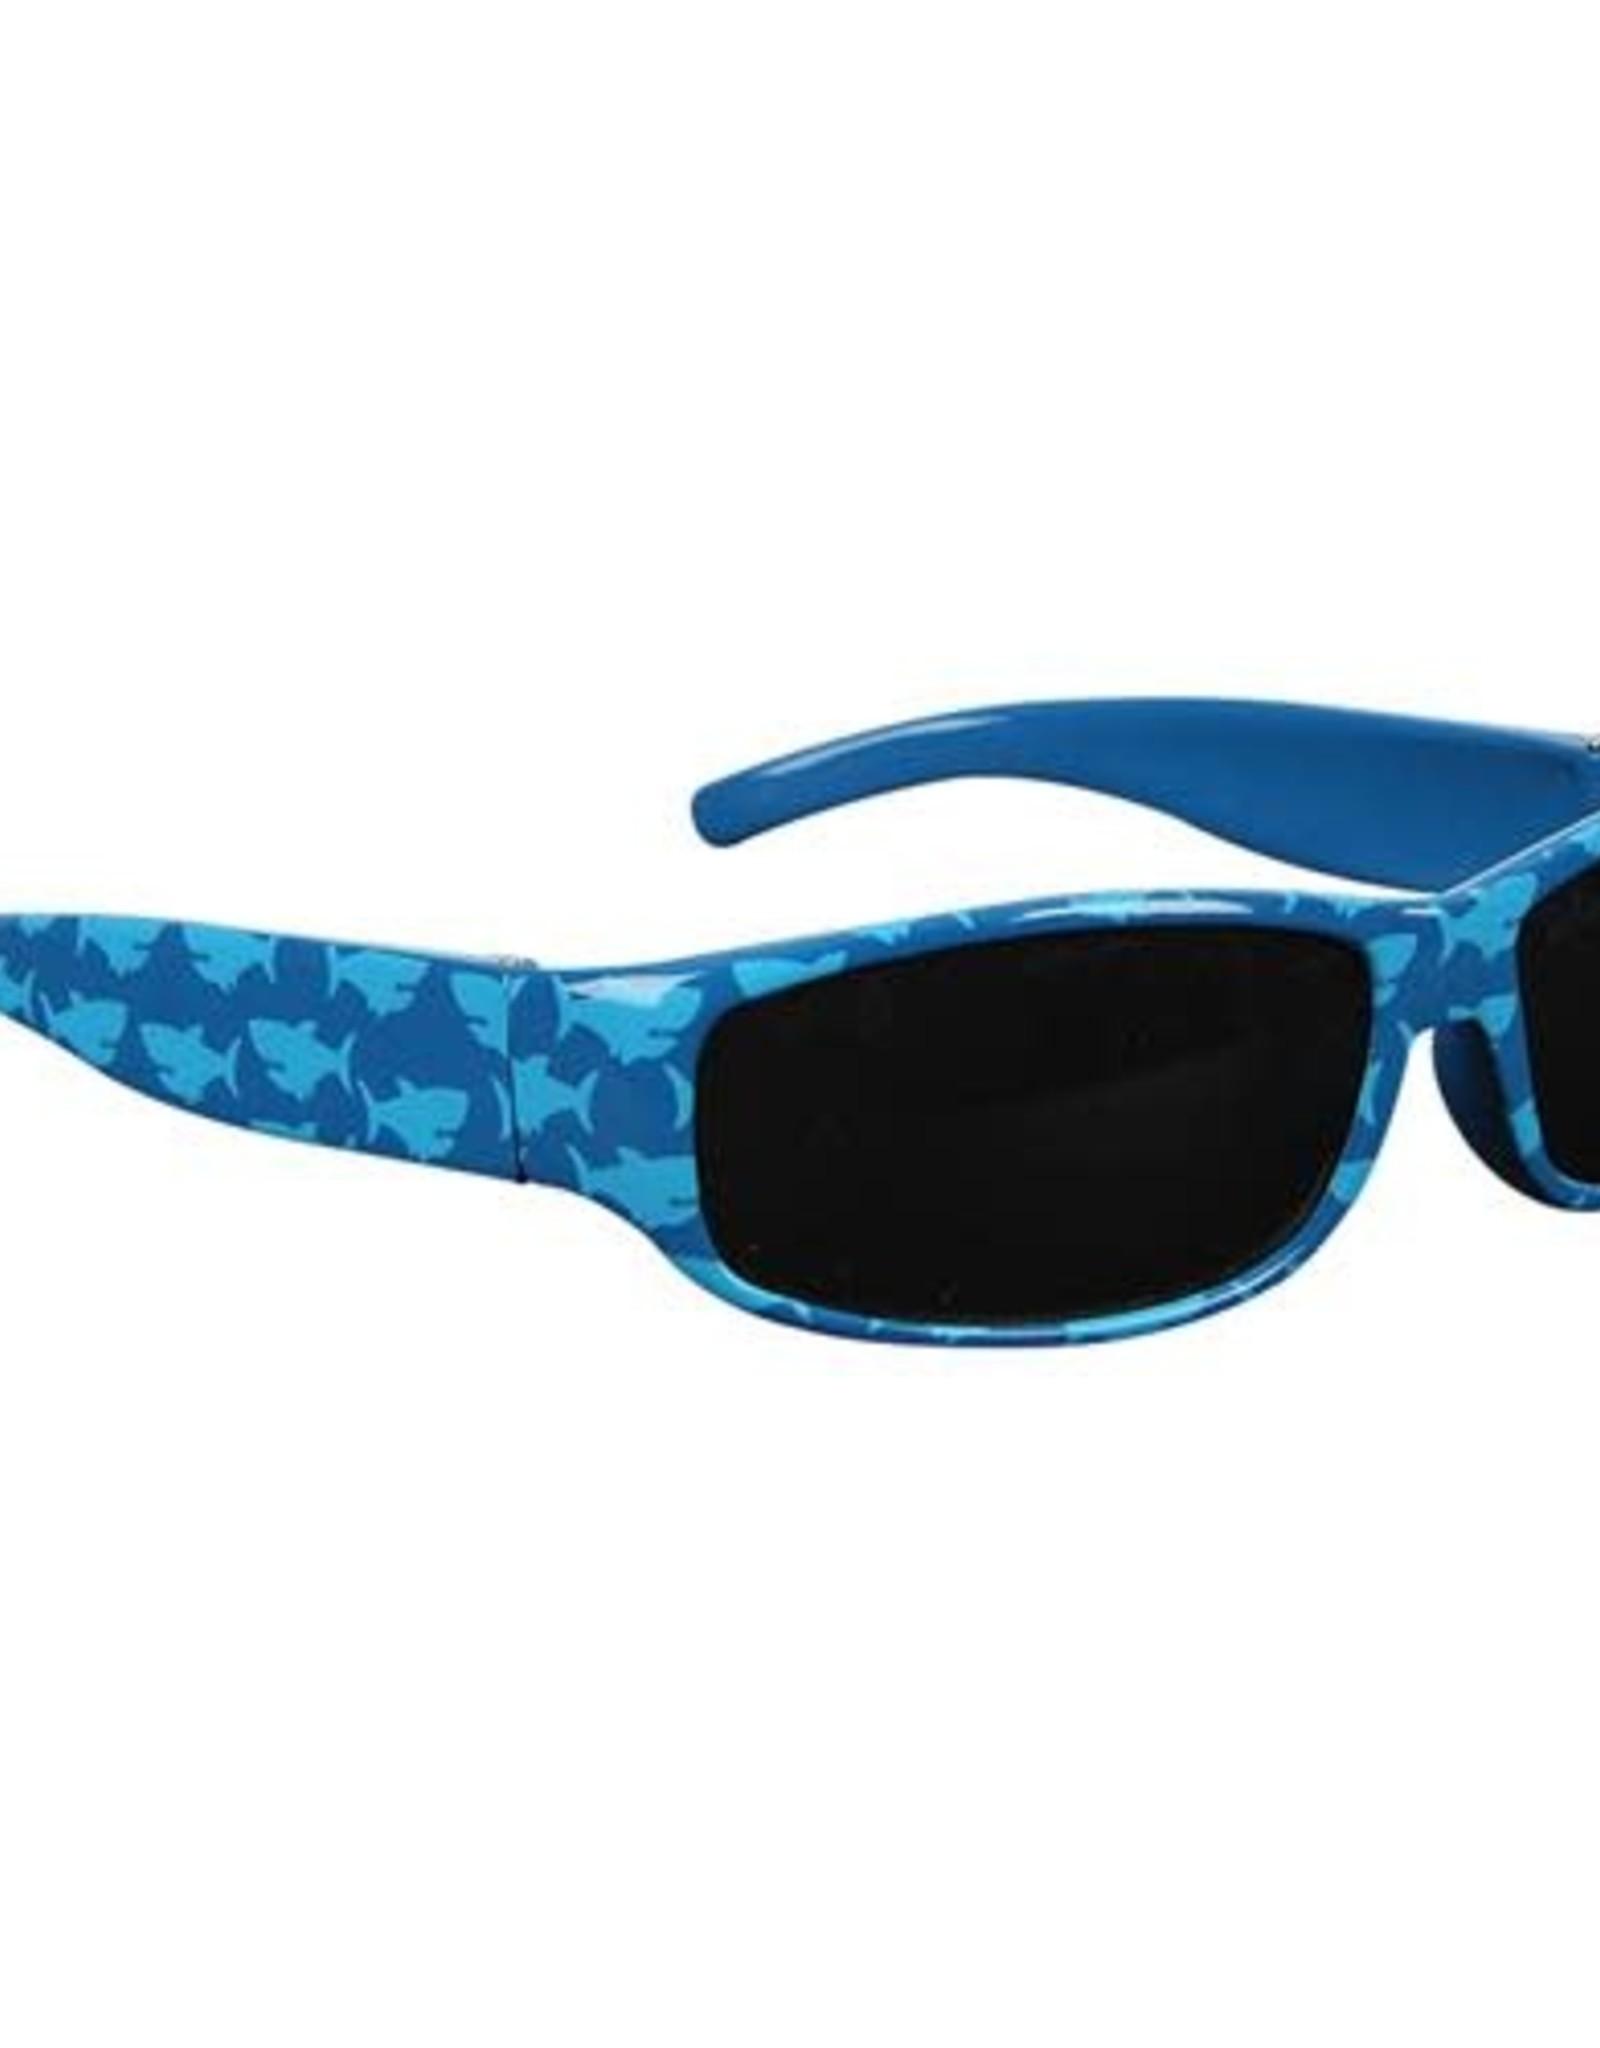 Stephen Joseph Kids Sunglasses - Shark